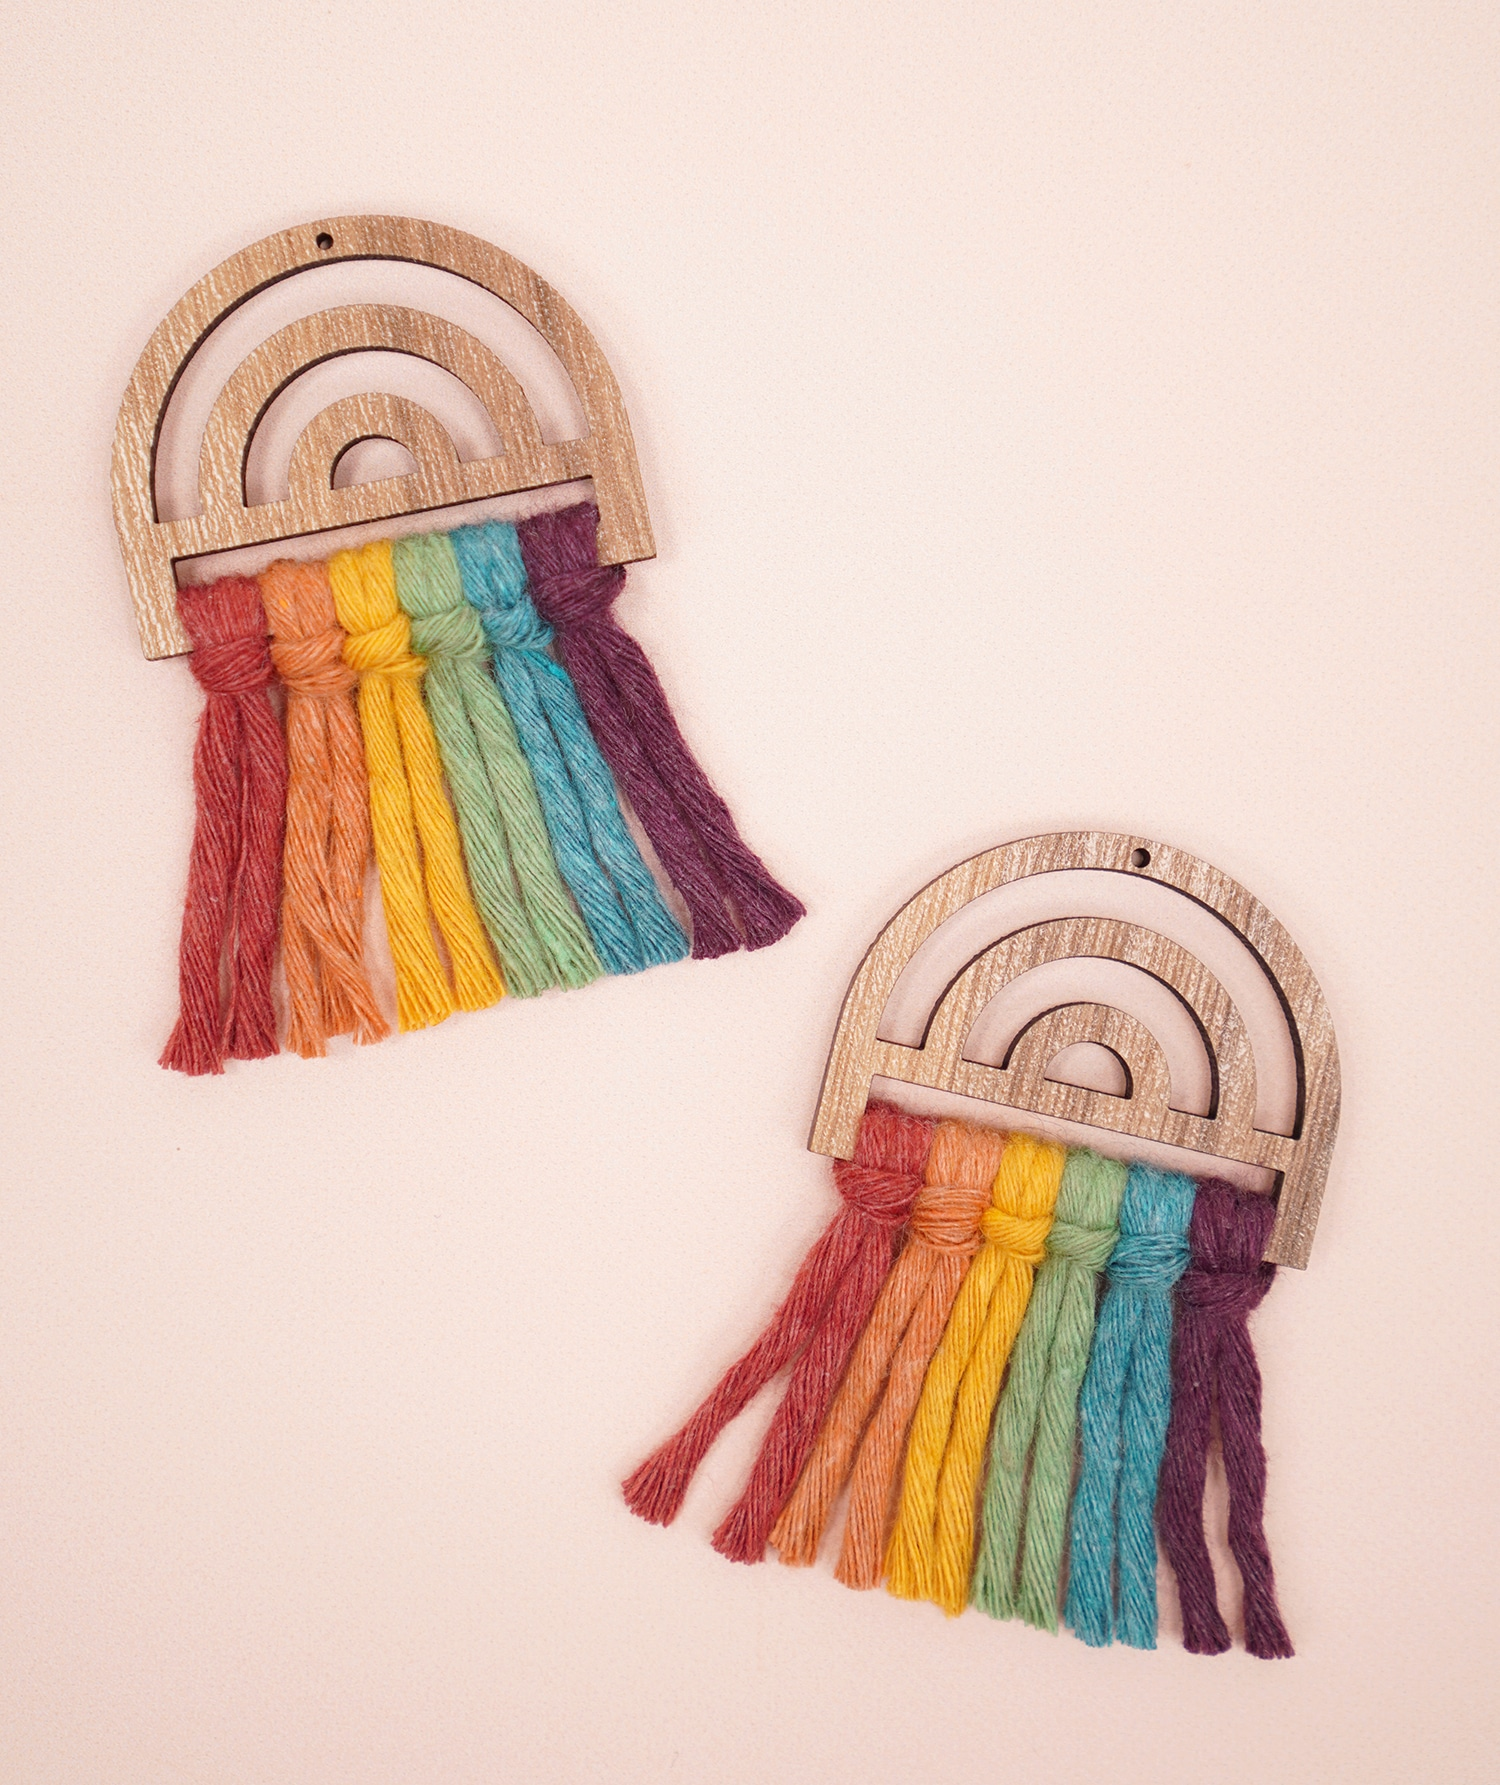 Unbrushed Rainbow Macrame Earrings in Wood Frames on peach background